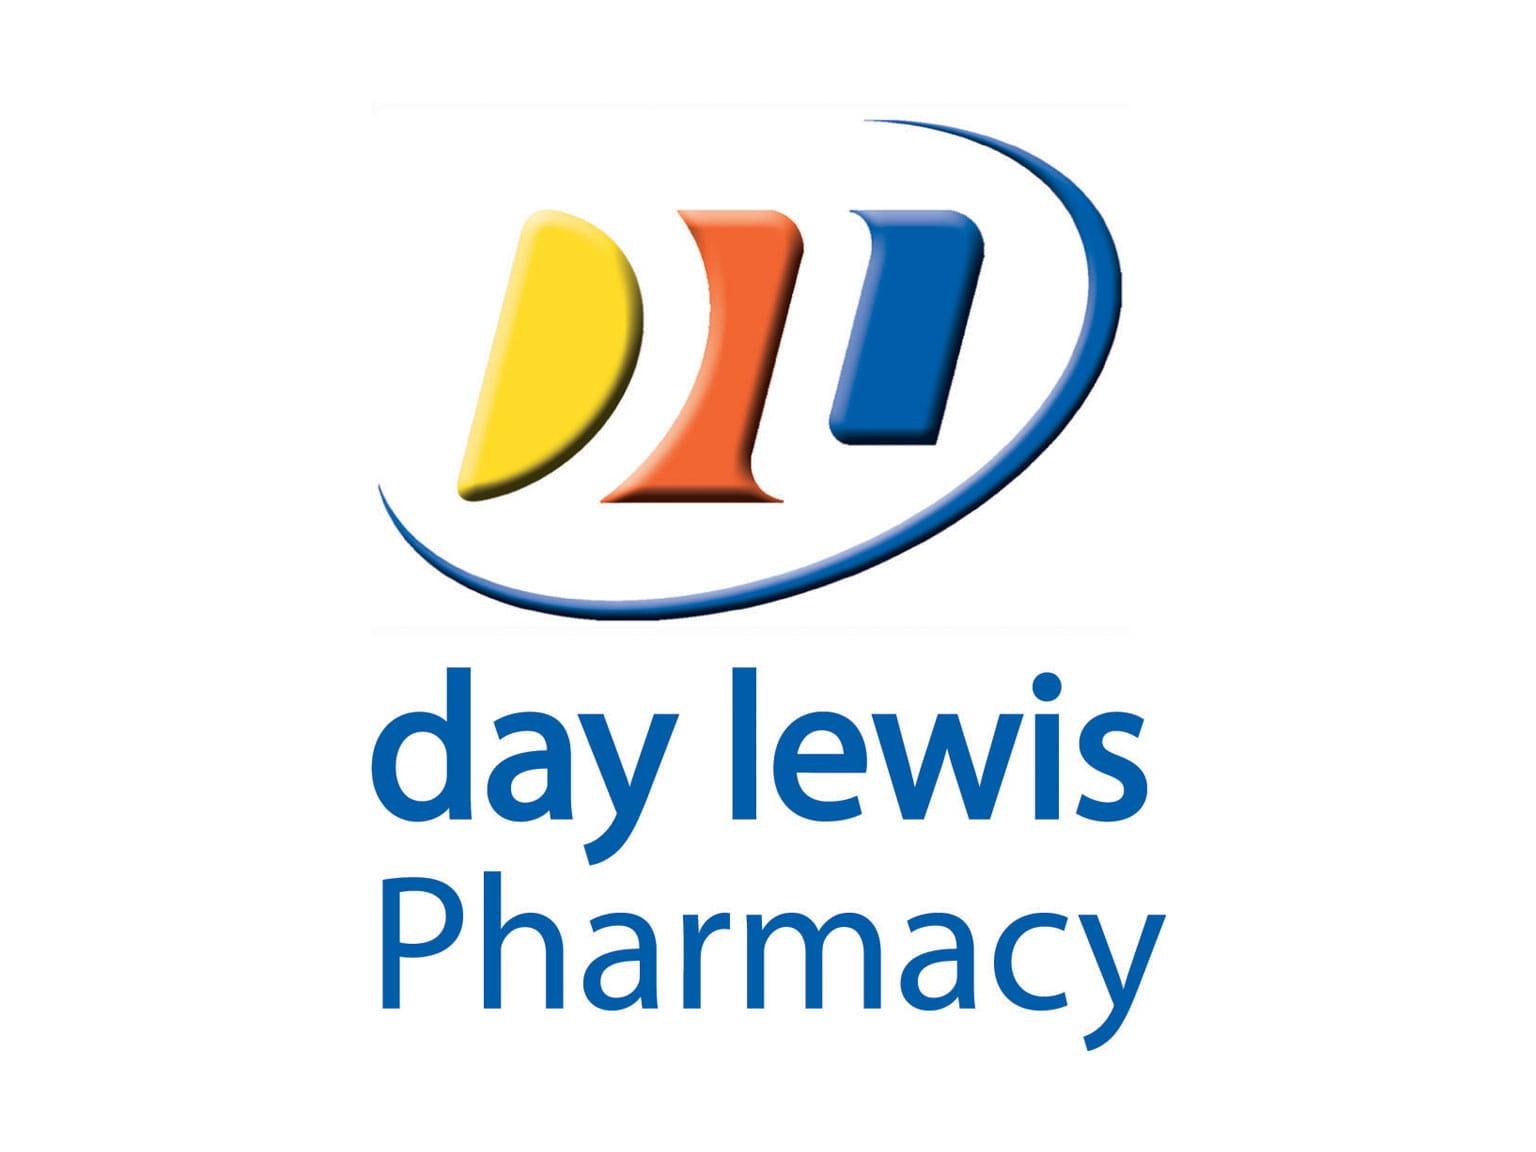 case studies study day lewis pharmacy healthcare